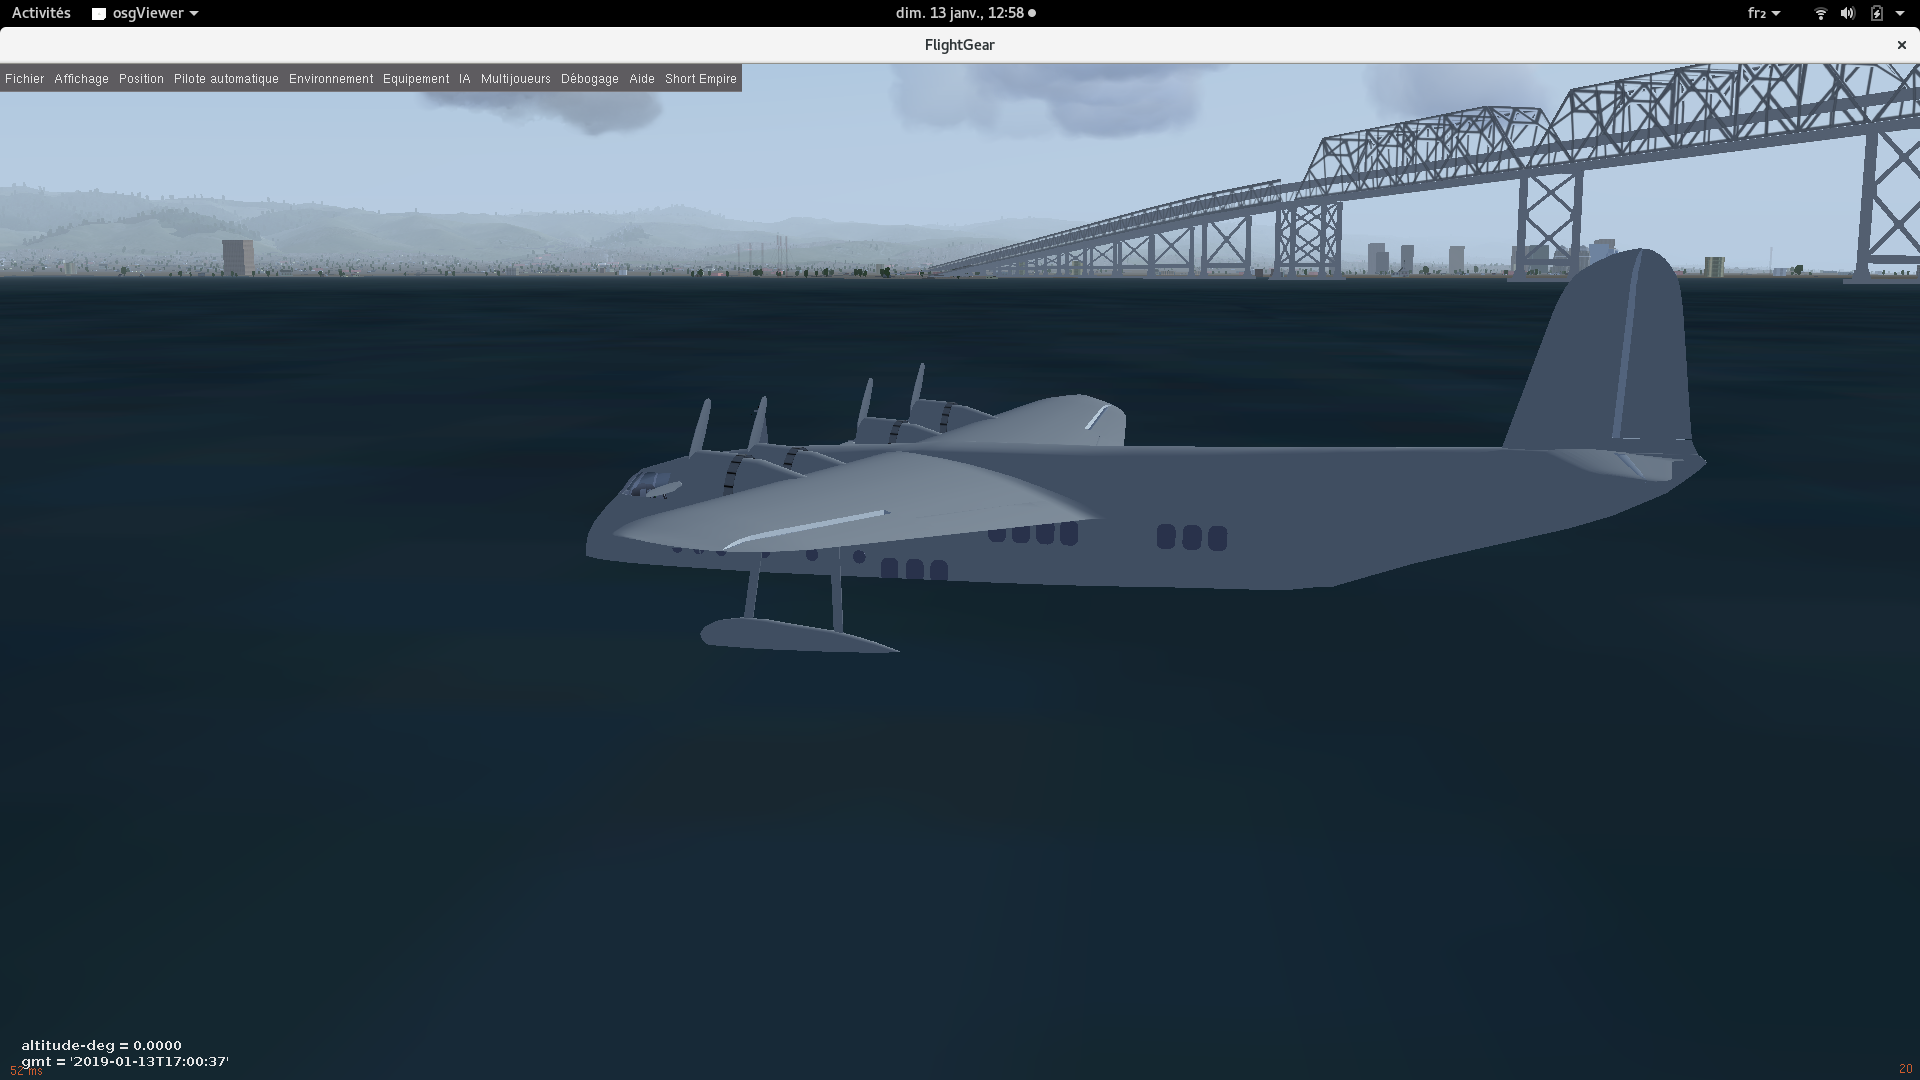 FlightGear is launched